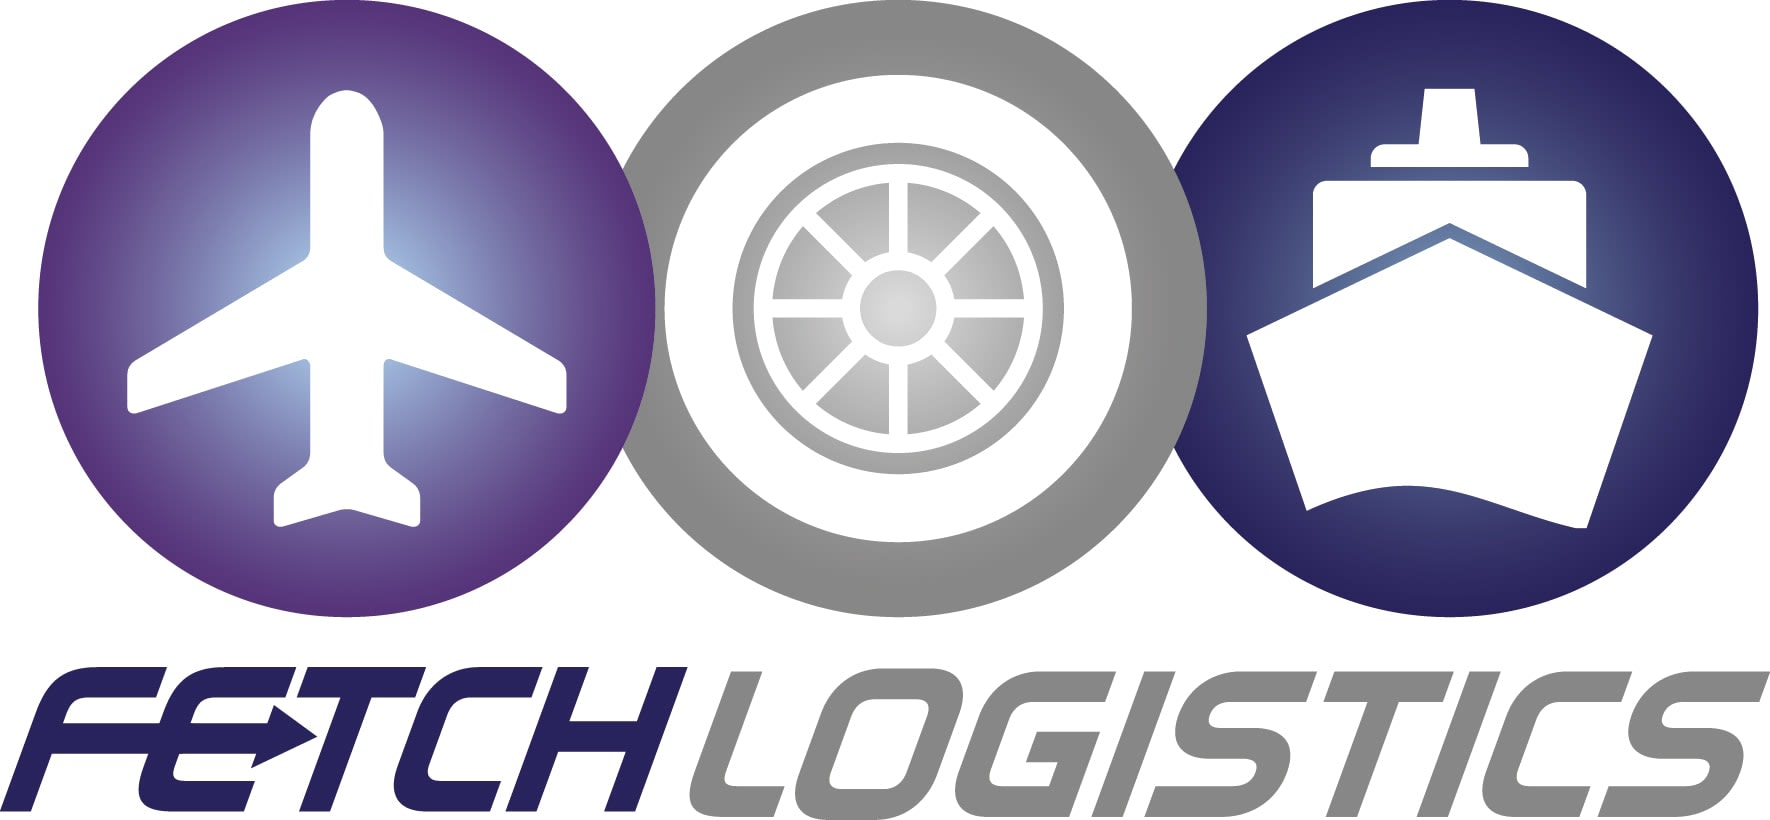 Fetch Logistics LTD